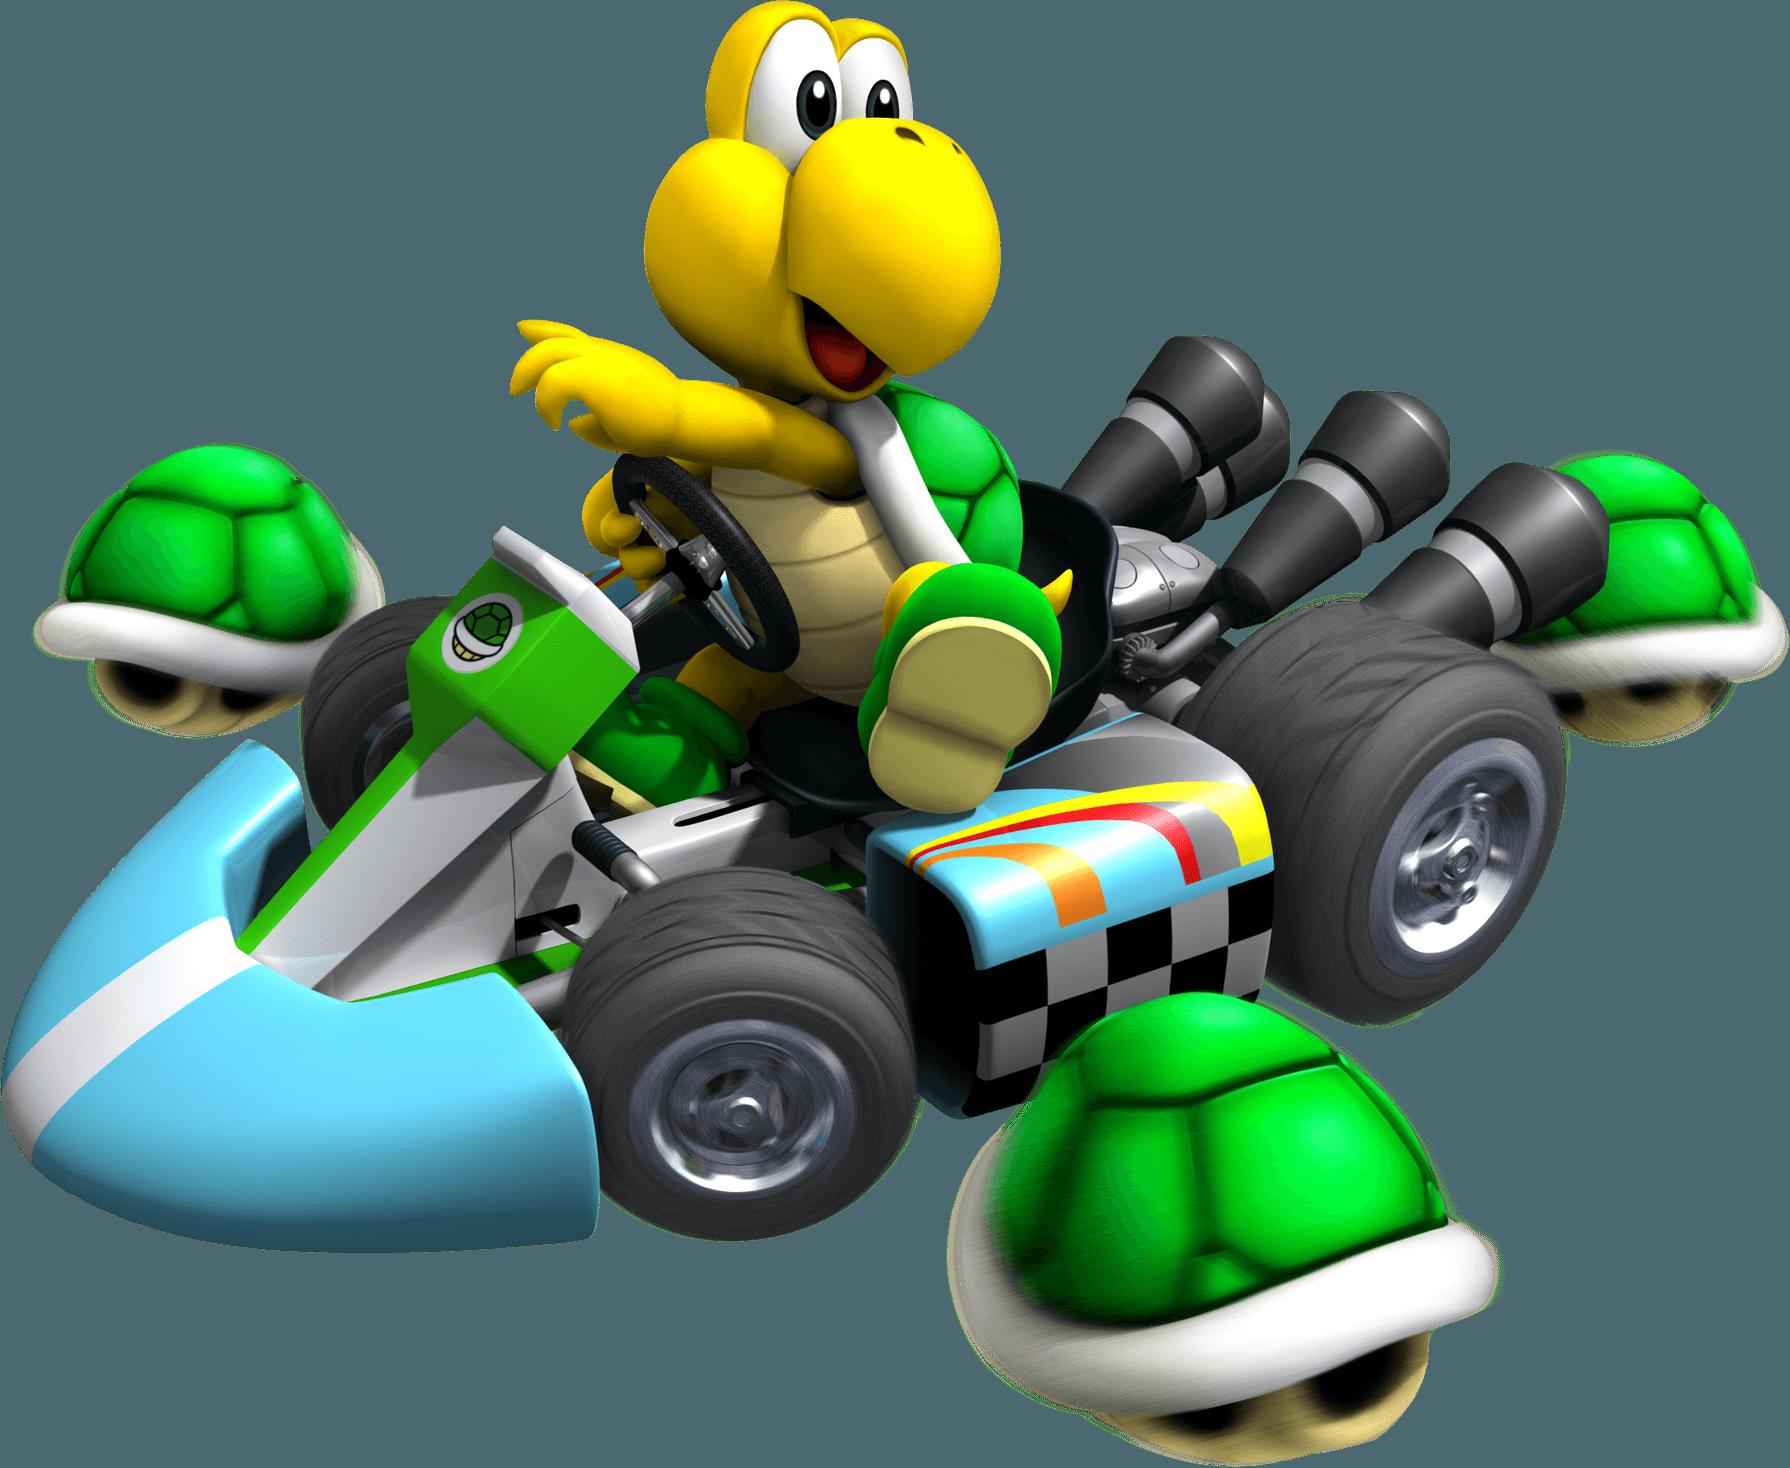 Resultado de imagem para mario kart triple green shell